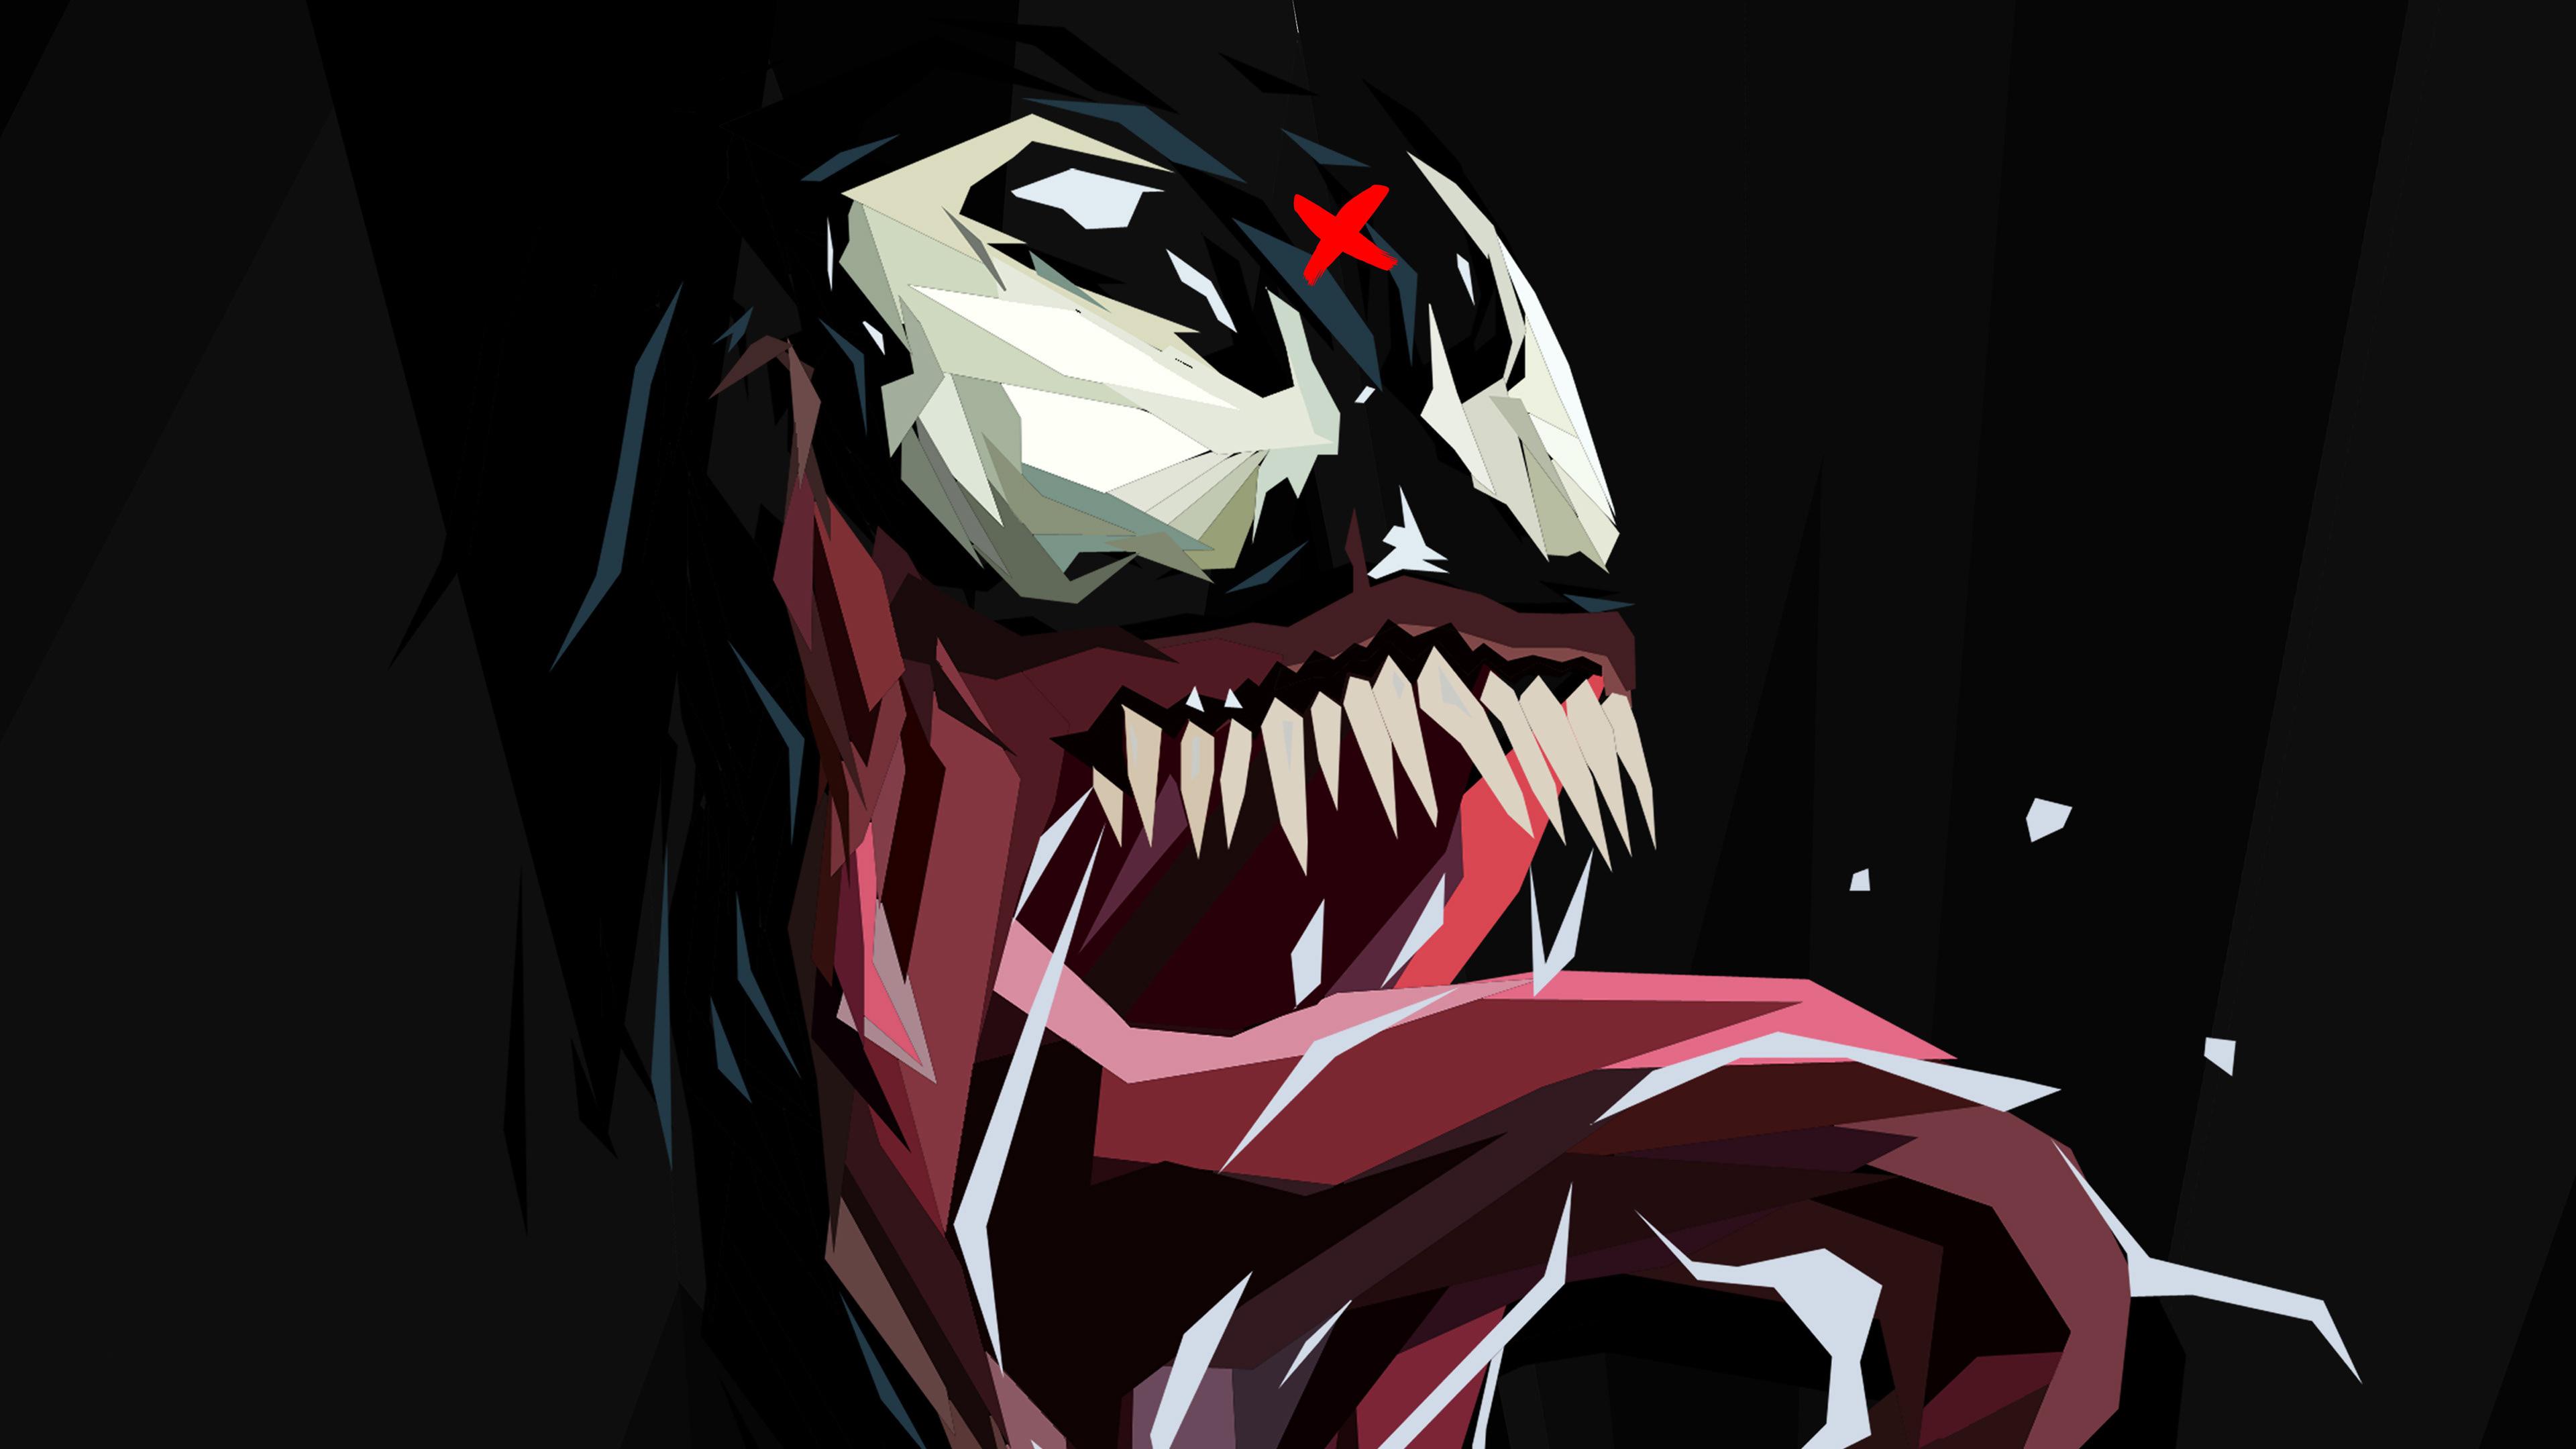 venom digital artwork 1536523634 - Venom Digital Artwork - Venom wallpapers, venom movie wallpapers, supervillain wallpapers, hd-wallpapers, digital art wallpapers, artwork wallpapers, art wallpapers, 4k-wallpapers